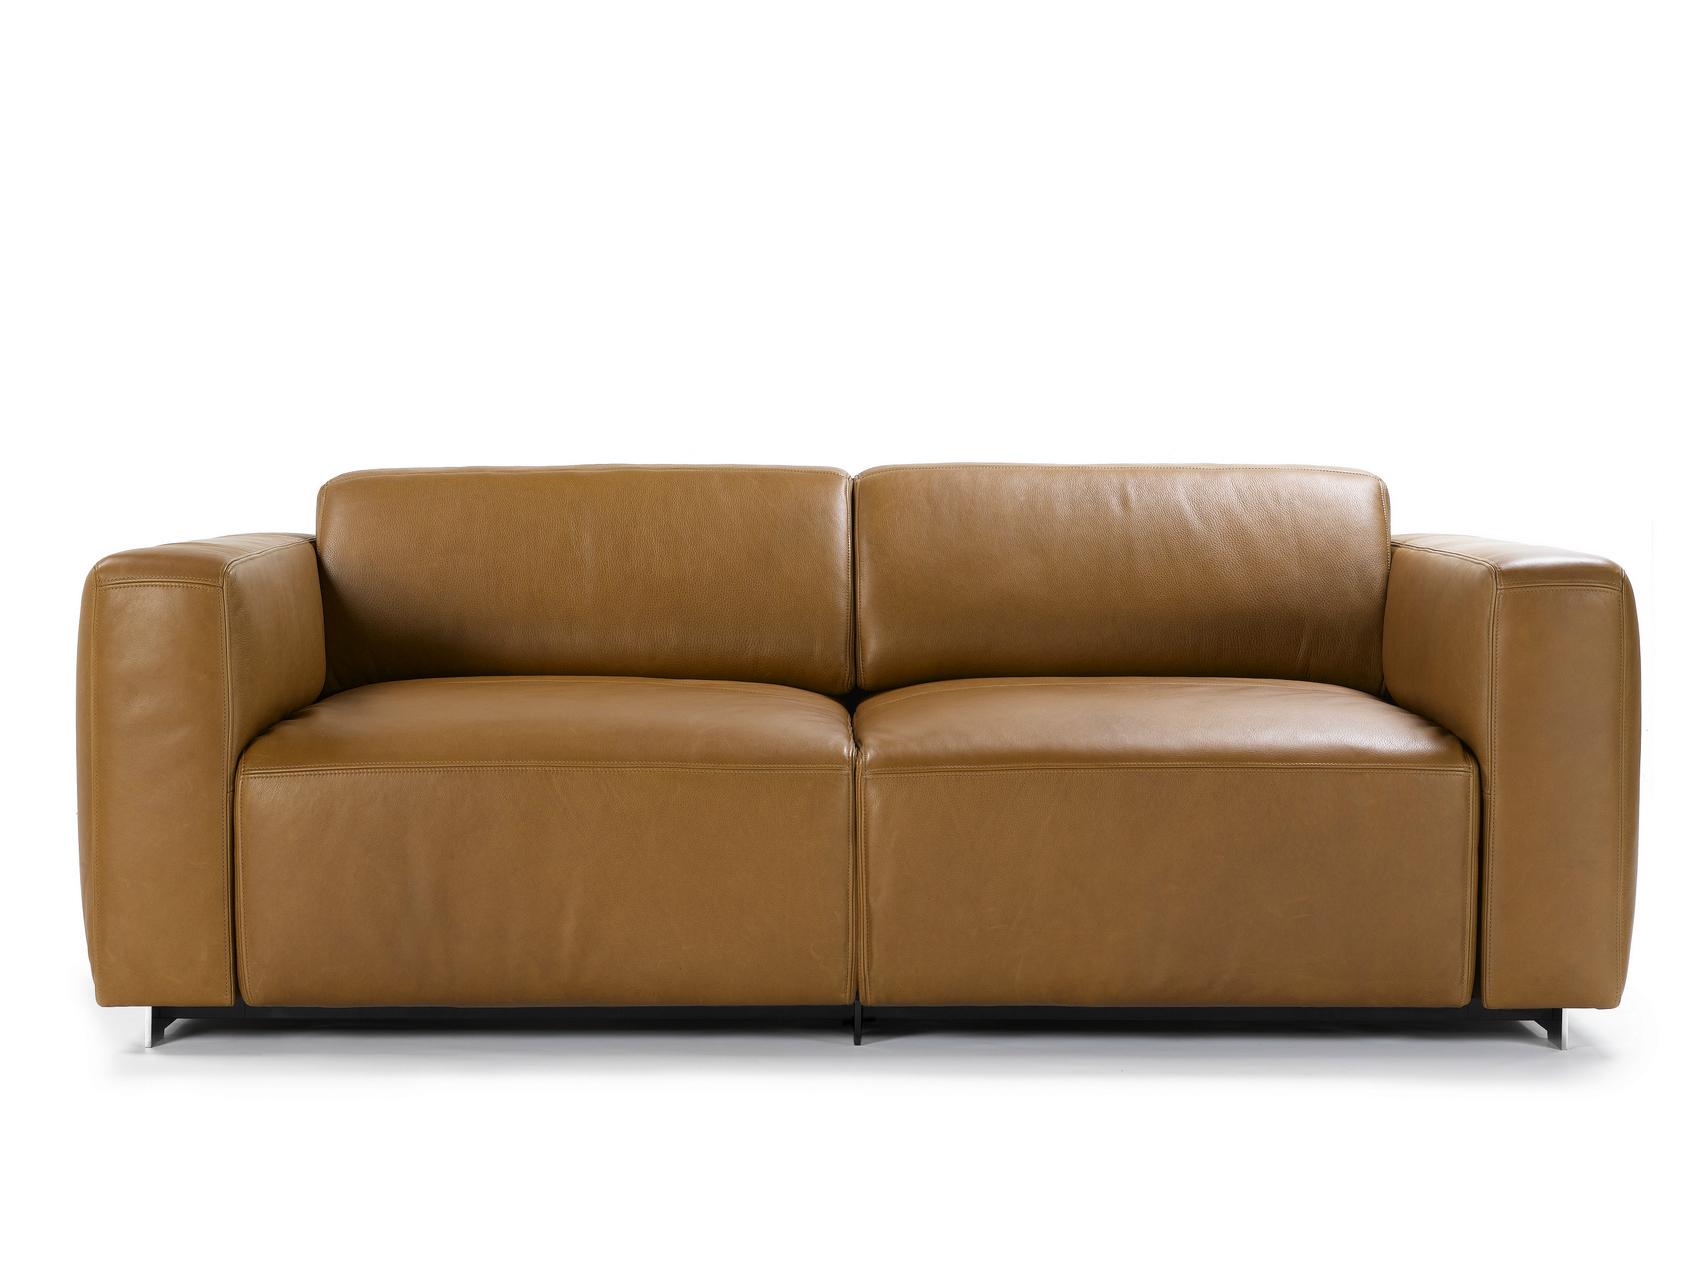 Long Island Sofa By Kai Stania For Durlet Sohomod Blog